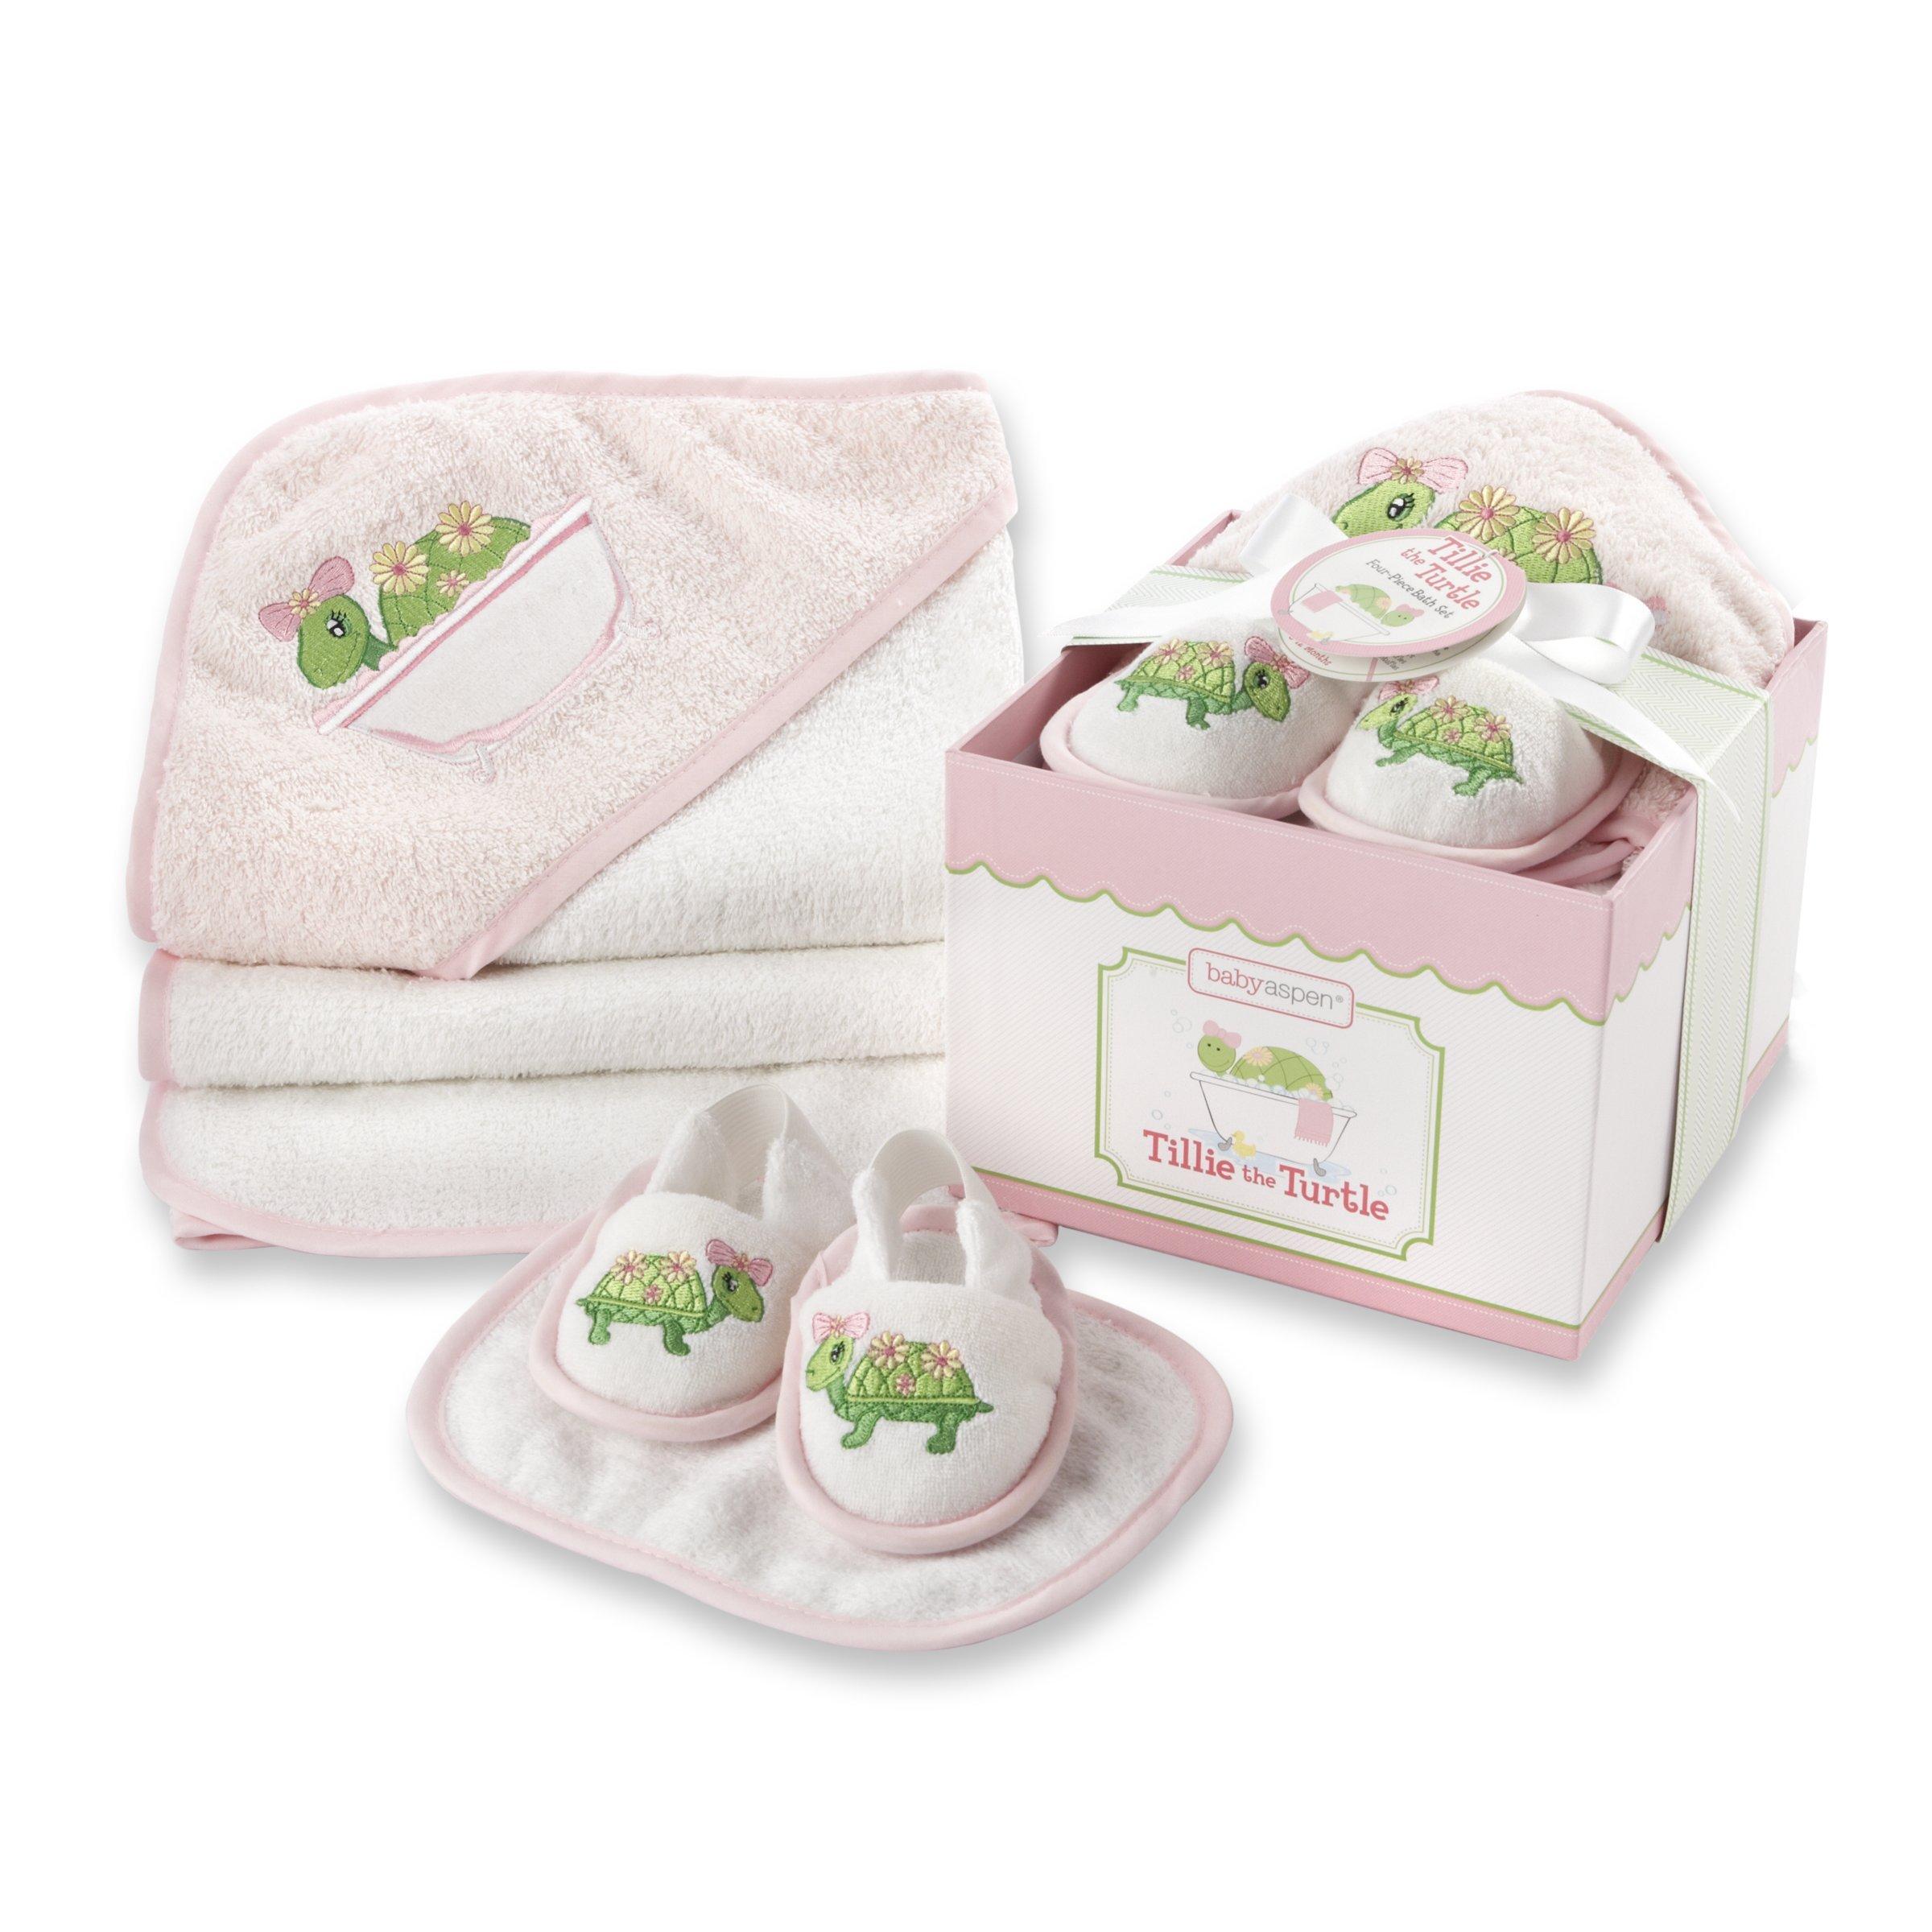 Baby Aspen, Tillie the Turtle Four-Piece Bathtime Gift Set, Pink, 0-6 Months